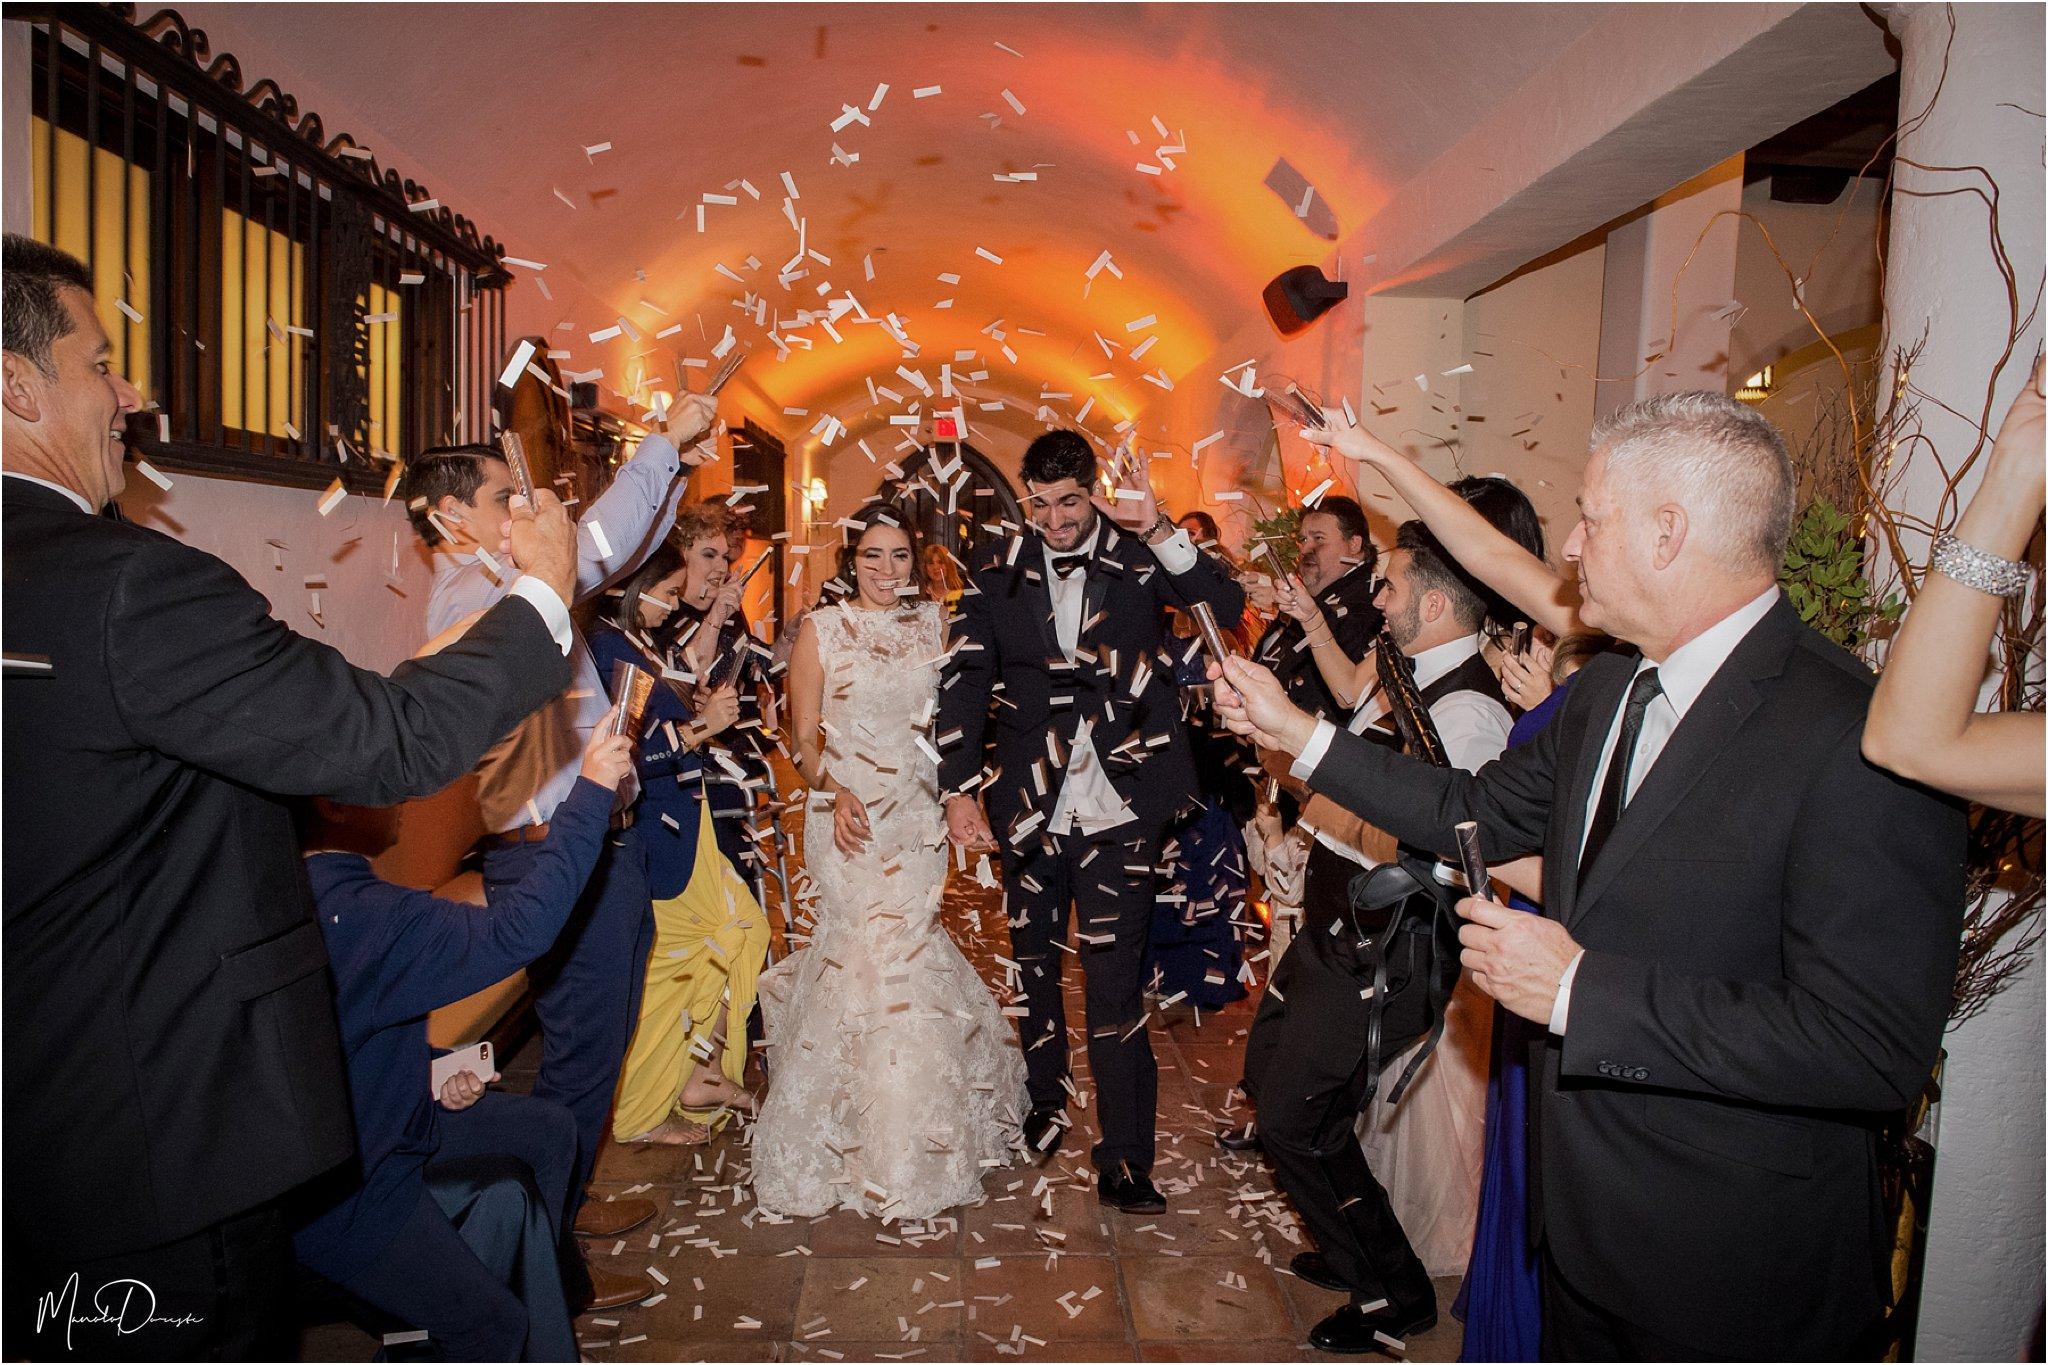 00949_ManoloDoreste_InFocusStudios_Wedding_Family_Photography_Miami_MiamiPhotographer.jpg